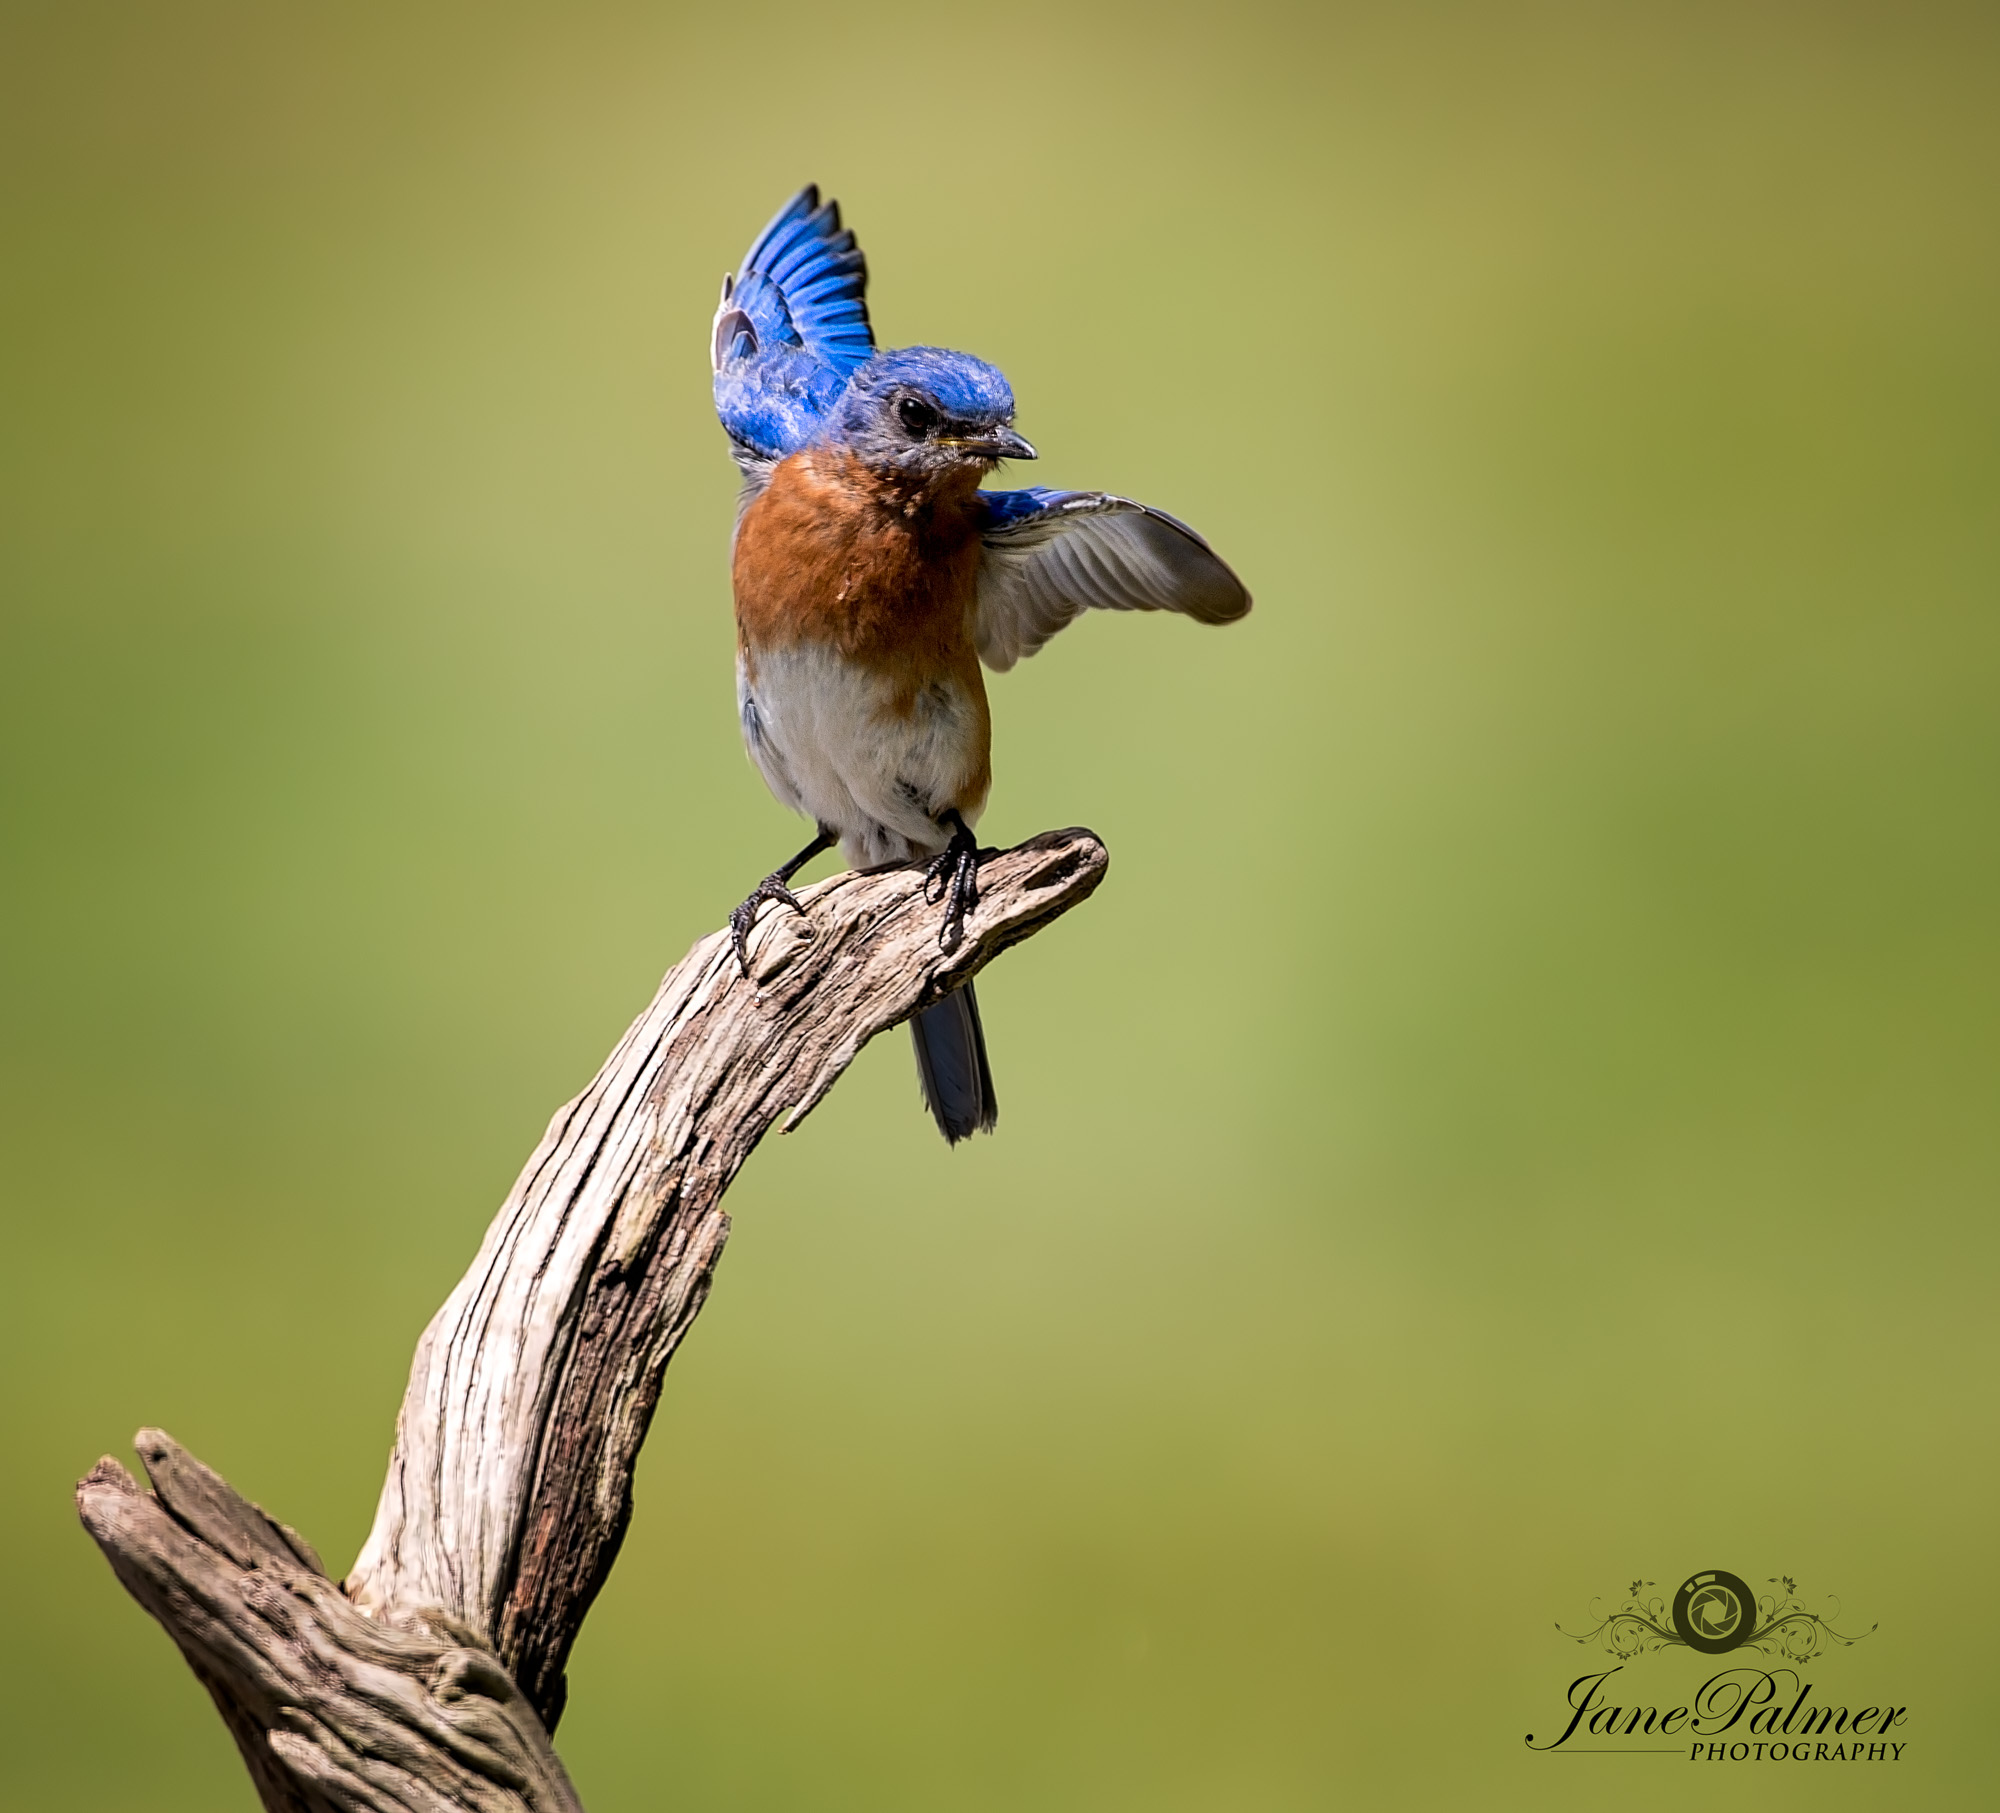 Bird Photography by Jane Palmer